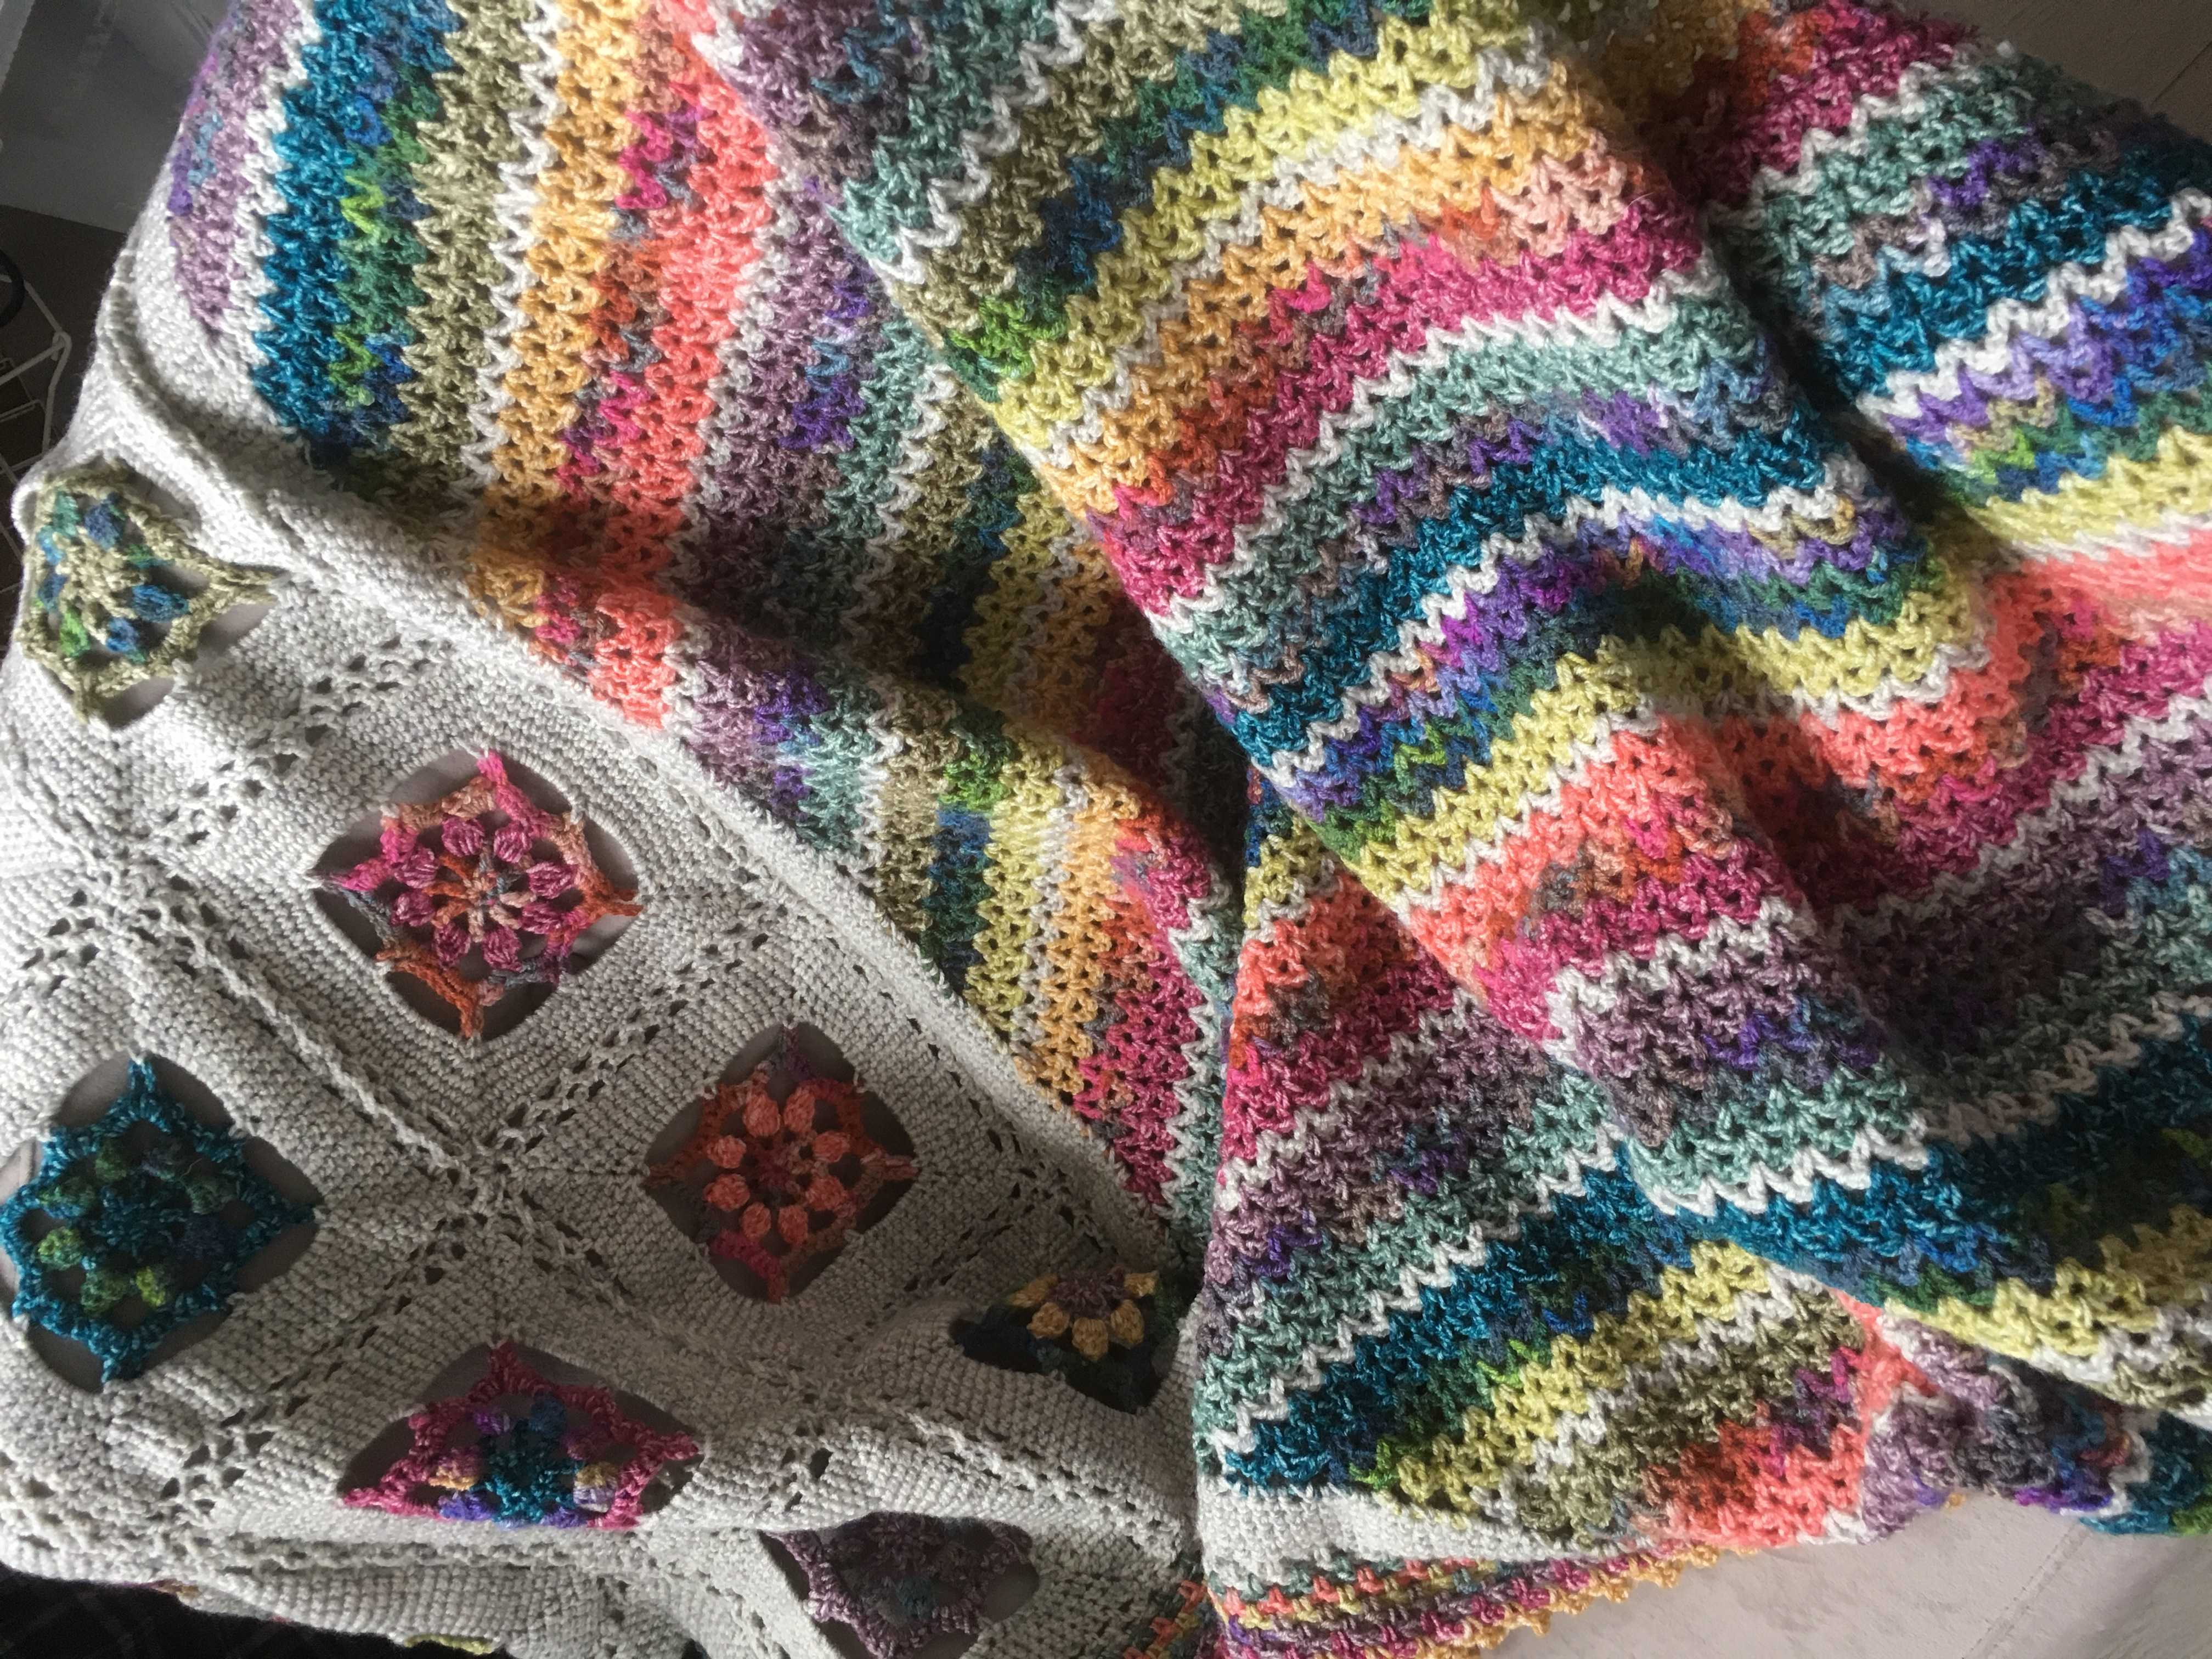 Batik blanket